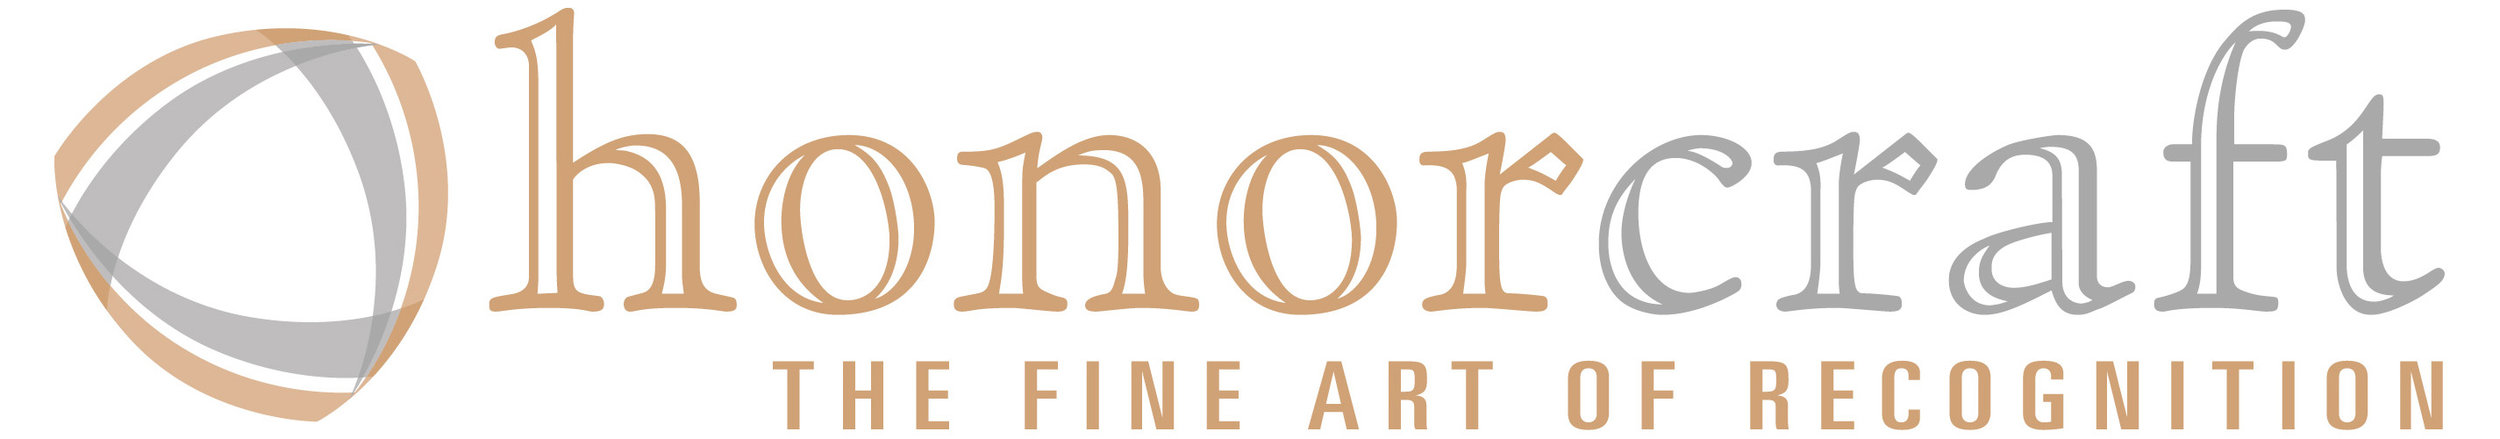 Honorcraft-logo_hi-res.jpeg